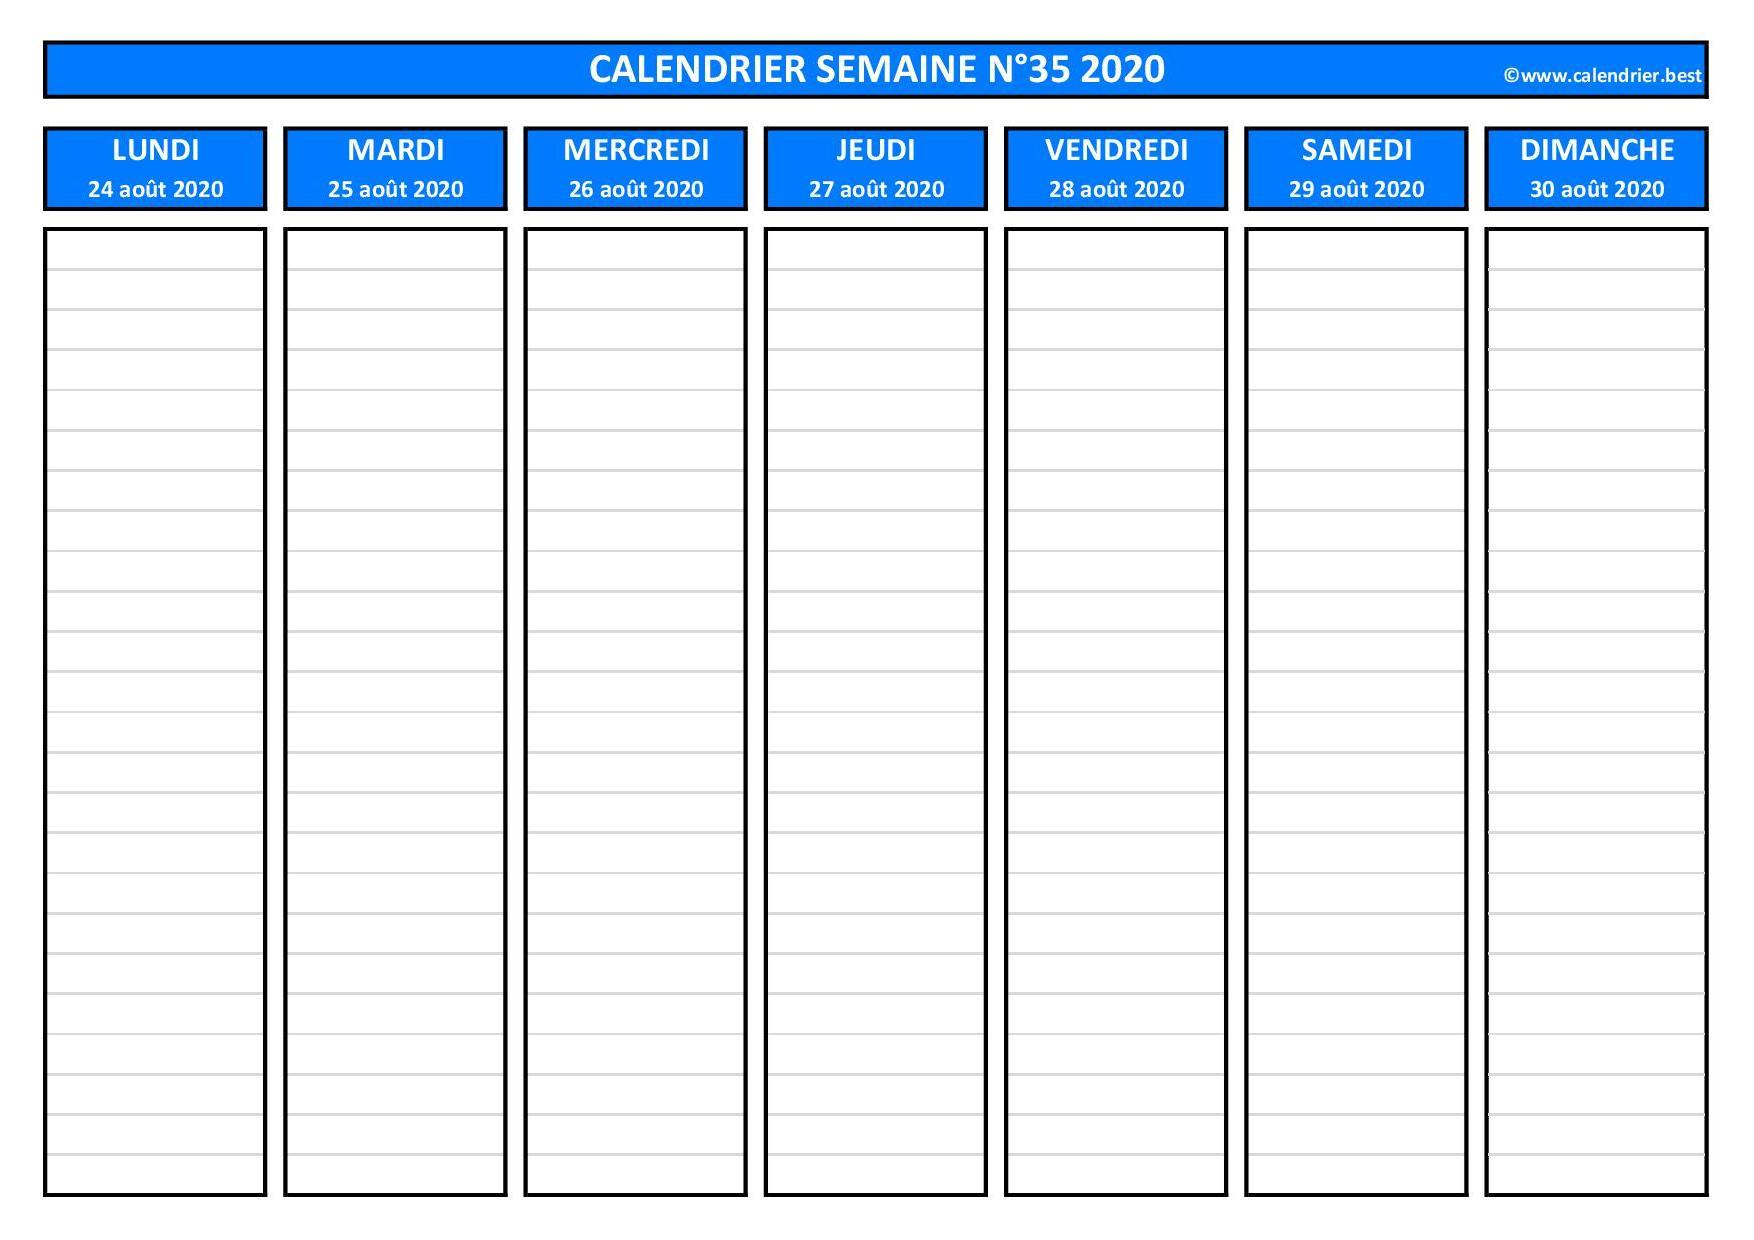 Semaine 35 2020 : dates, calendrier et planning  Calendrier.best